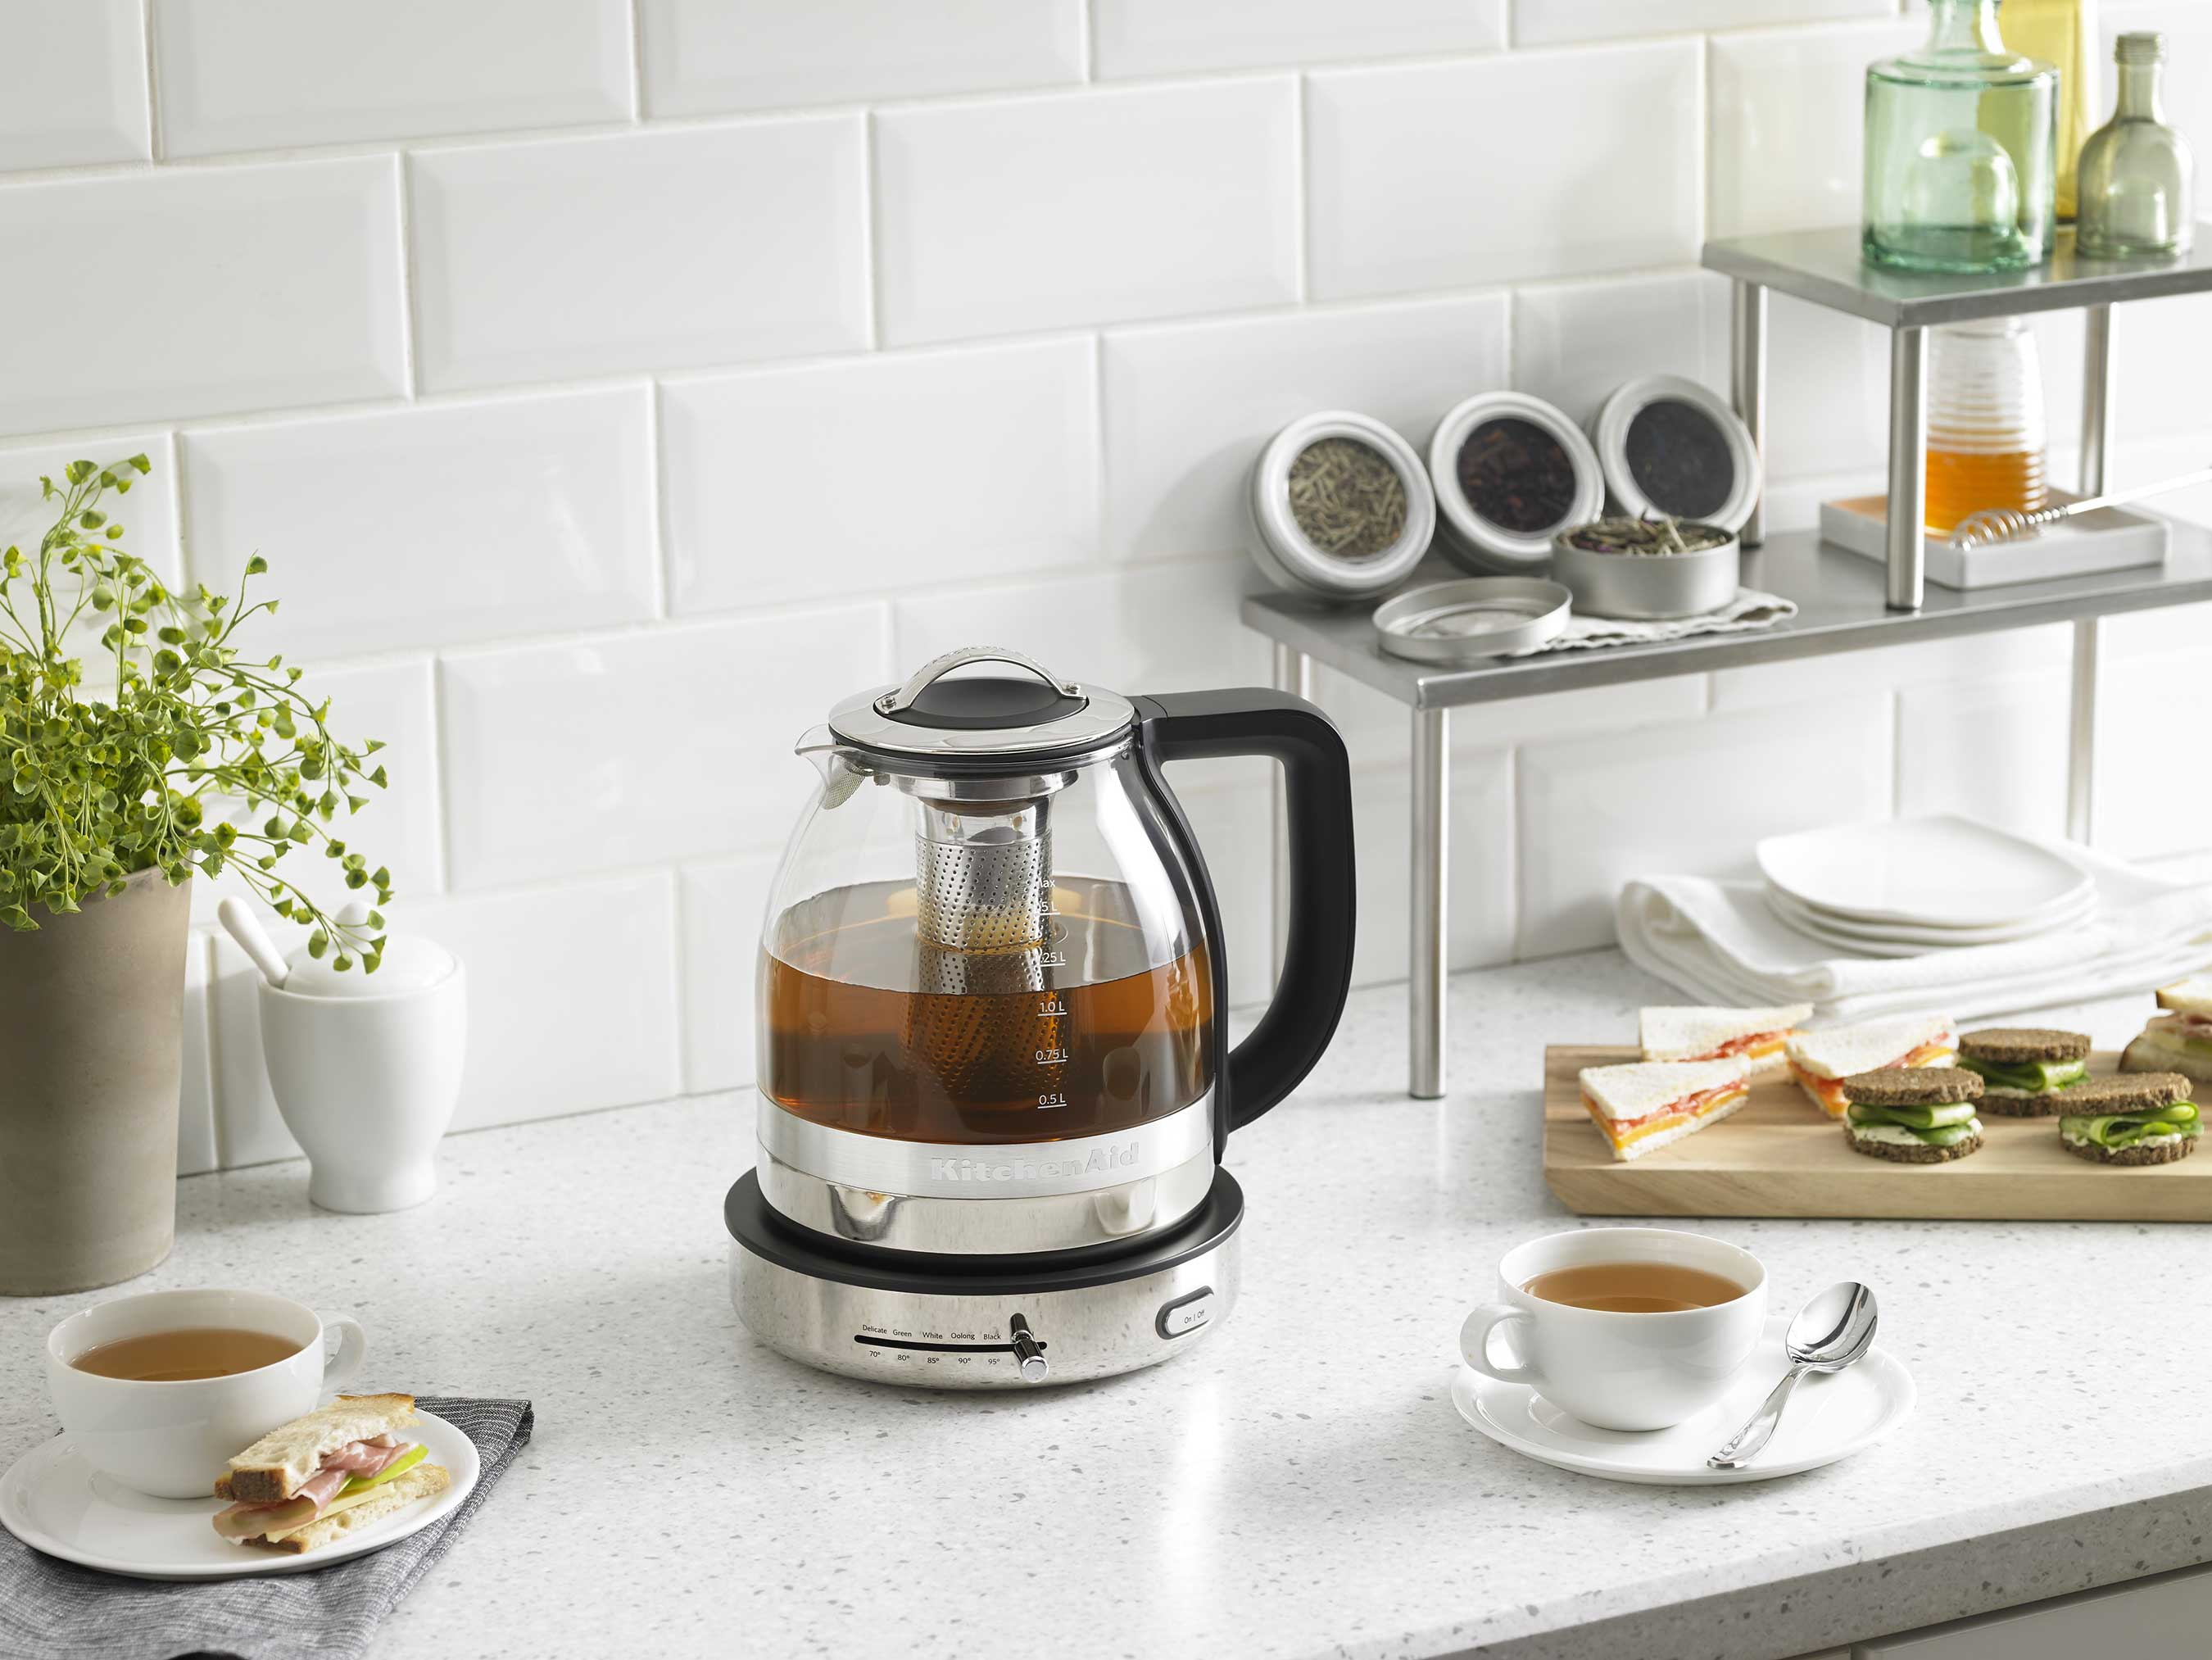 New KitchenAid Glass Tea Kettle Is A Tea Lovers Dream